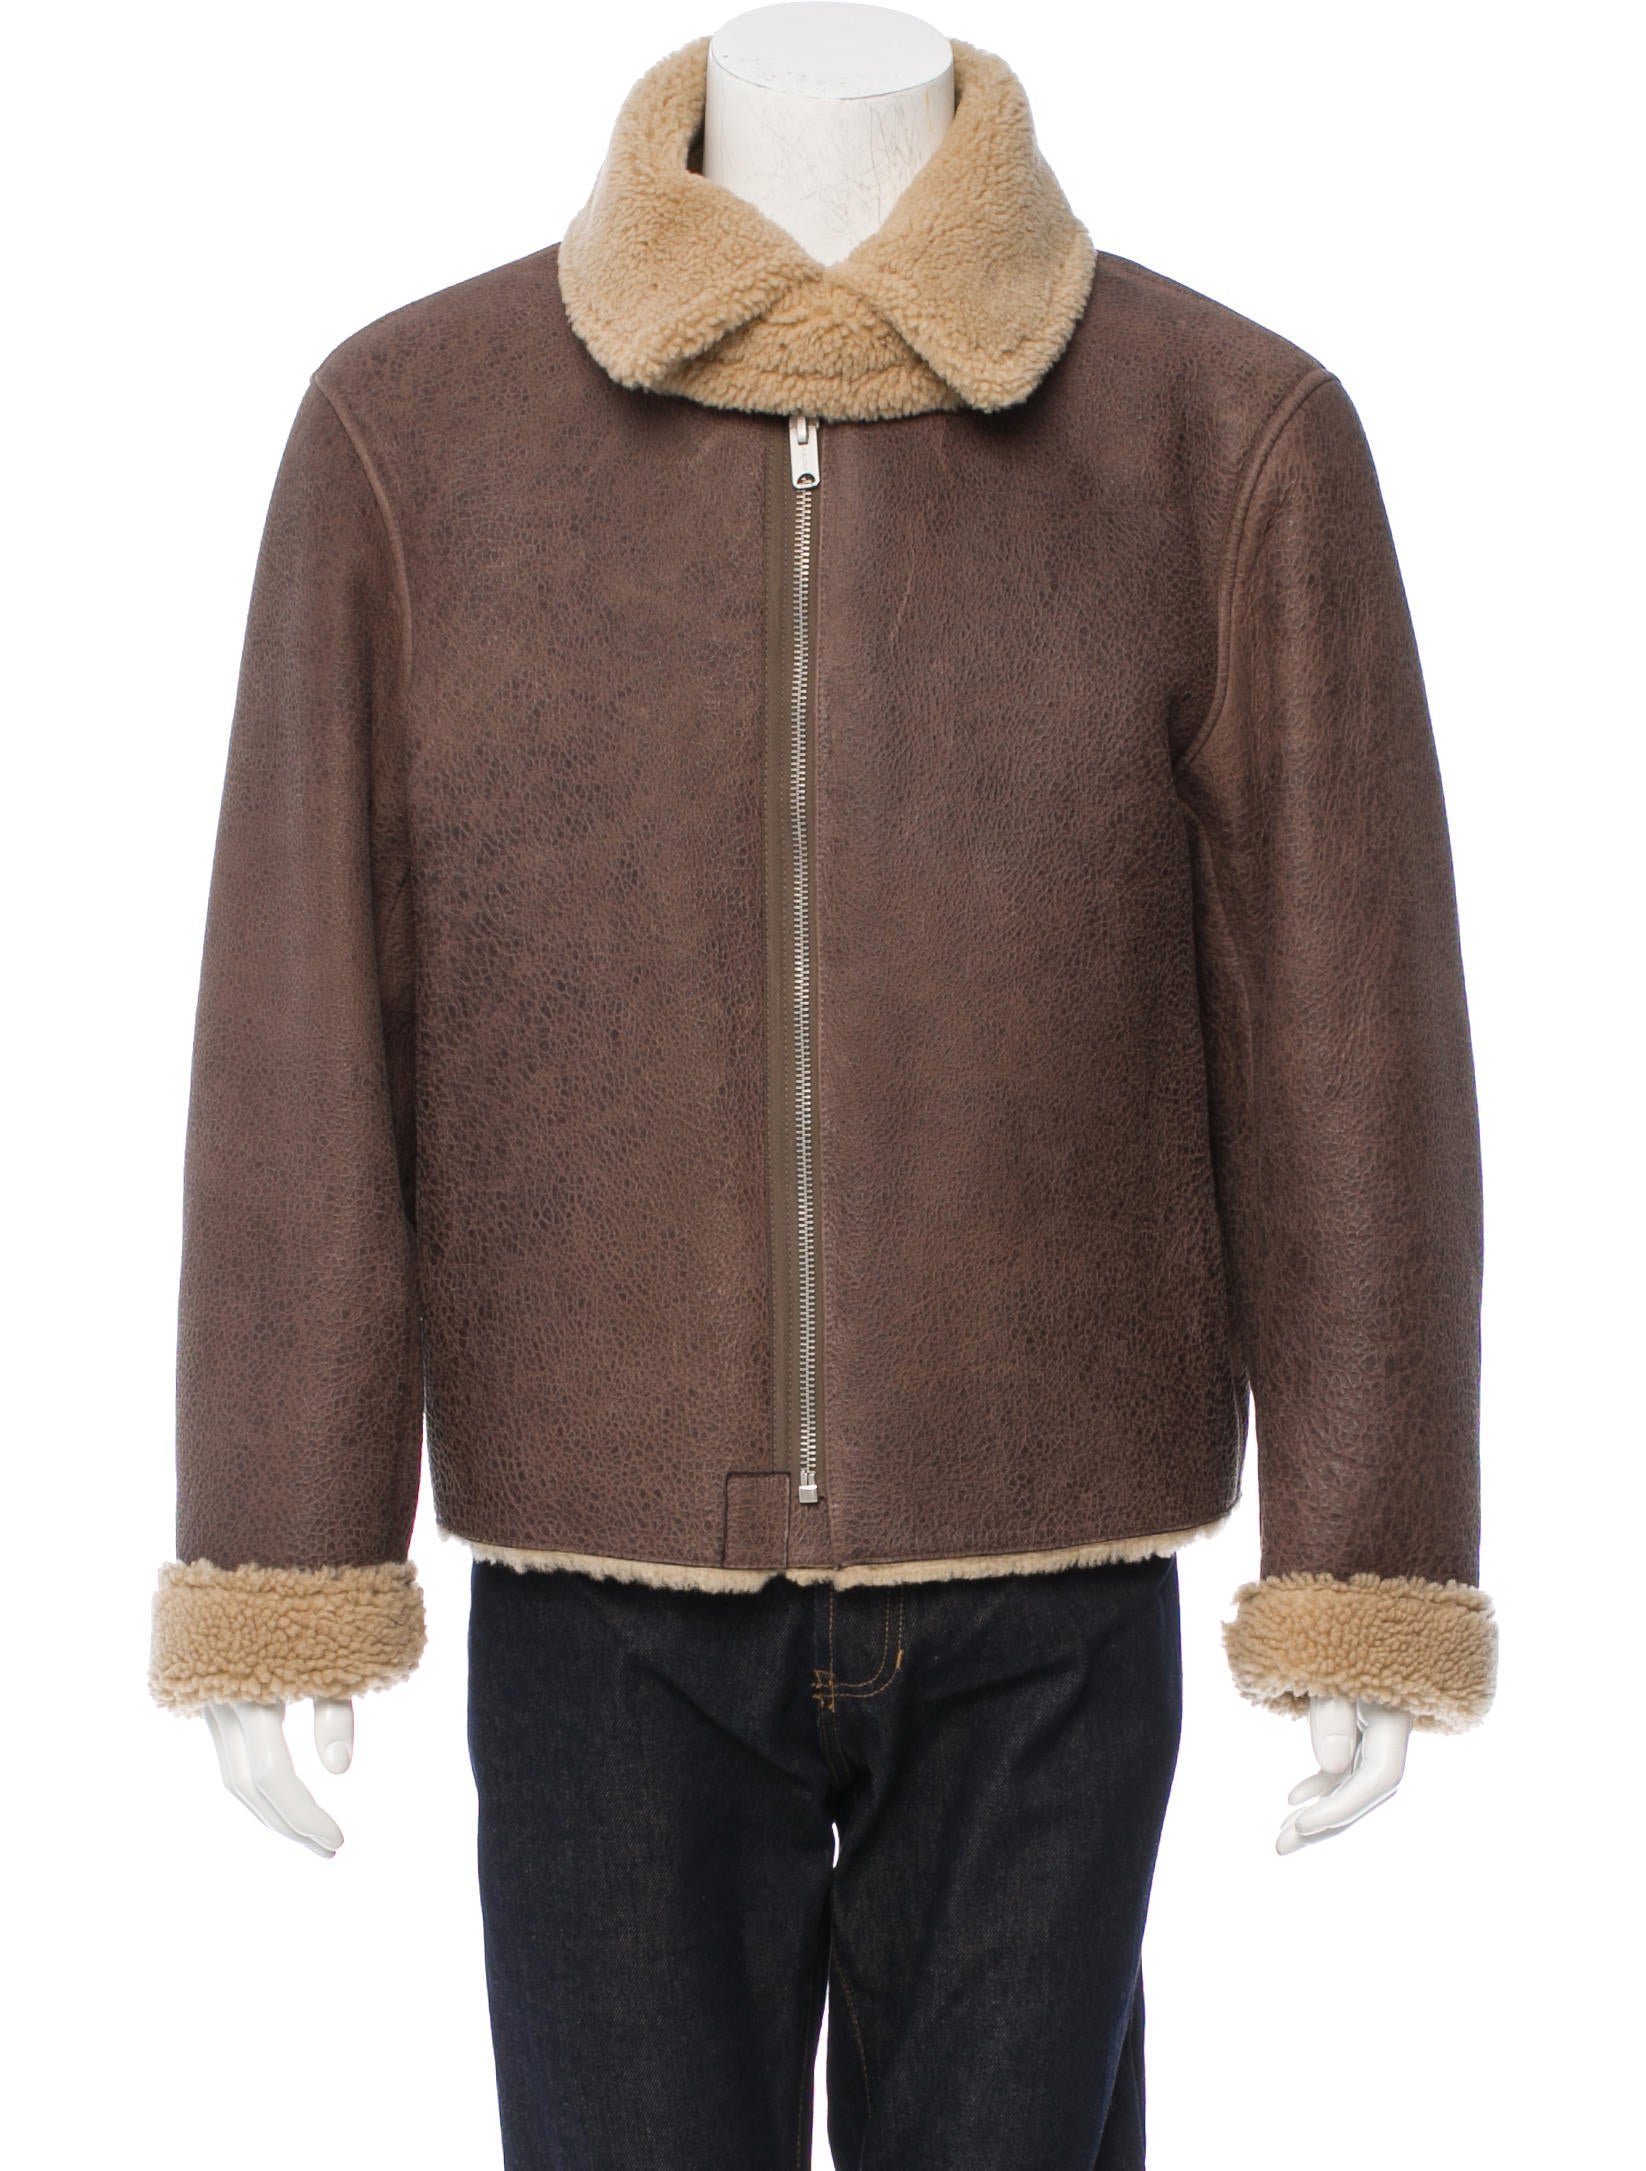 38481ca9c36ee Yeezy Season 3 Flight Jacket - Clothing - WYEEZ20151